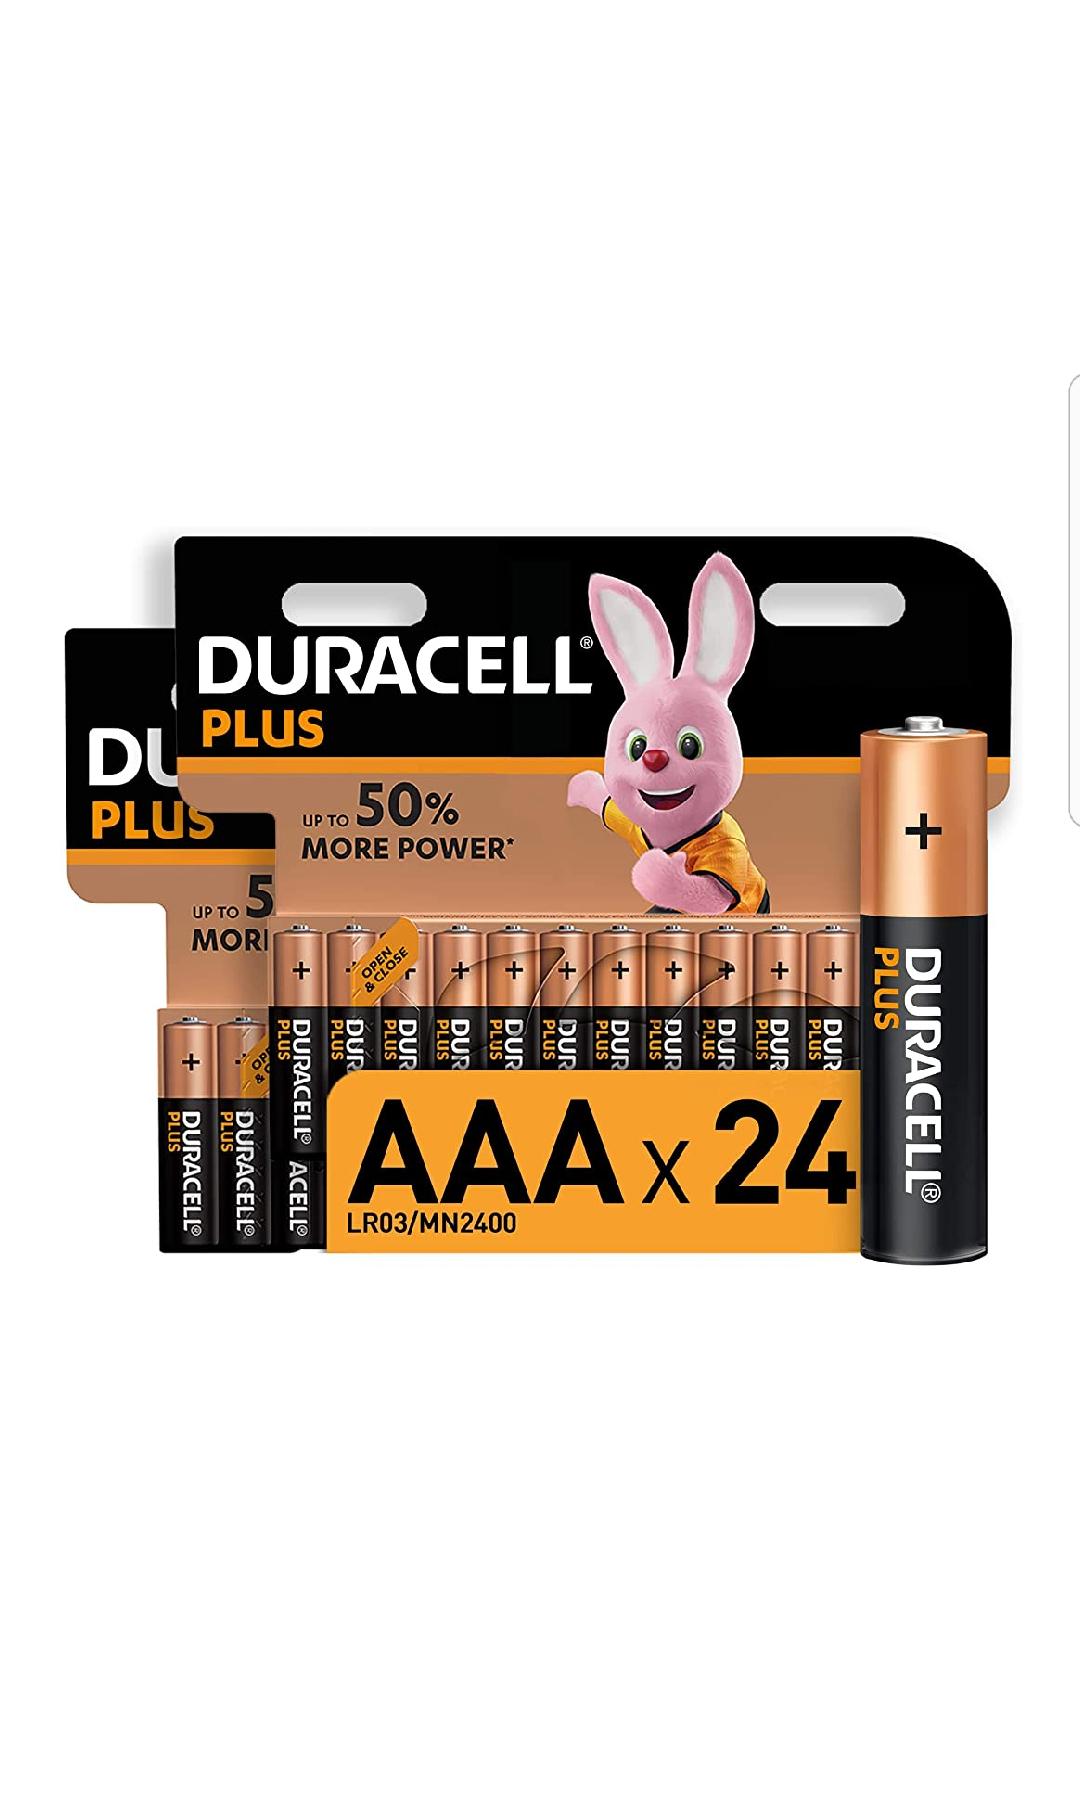 Lot de 24 piles alcalines AAA Duracell Plus - 1,5 Volts, LR03 / MN2400